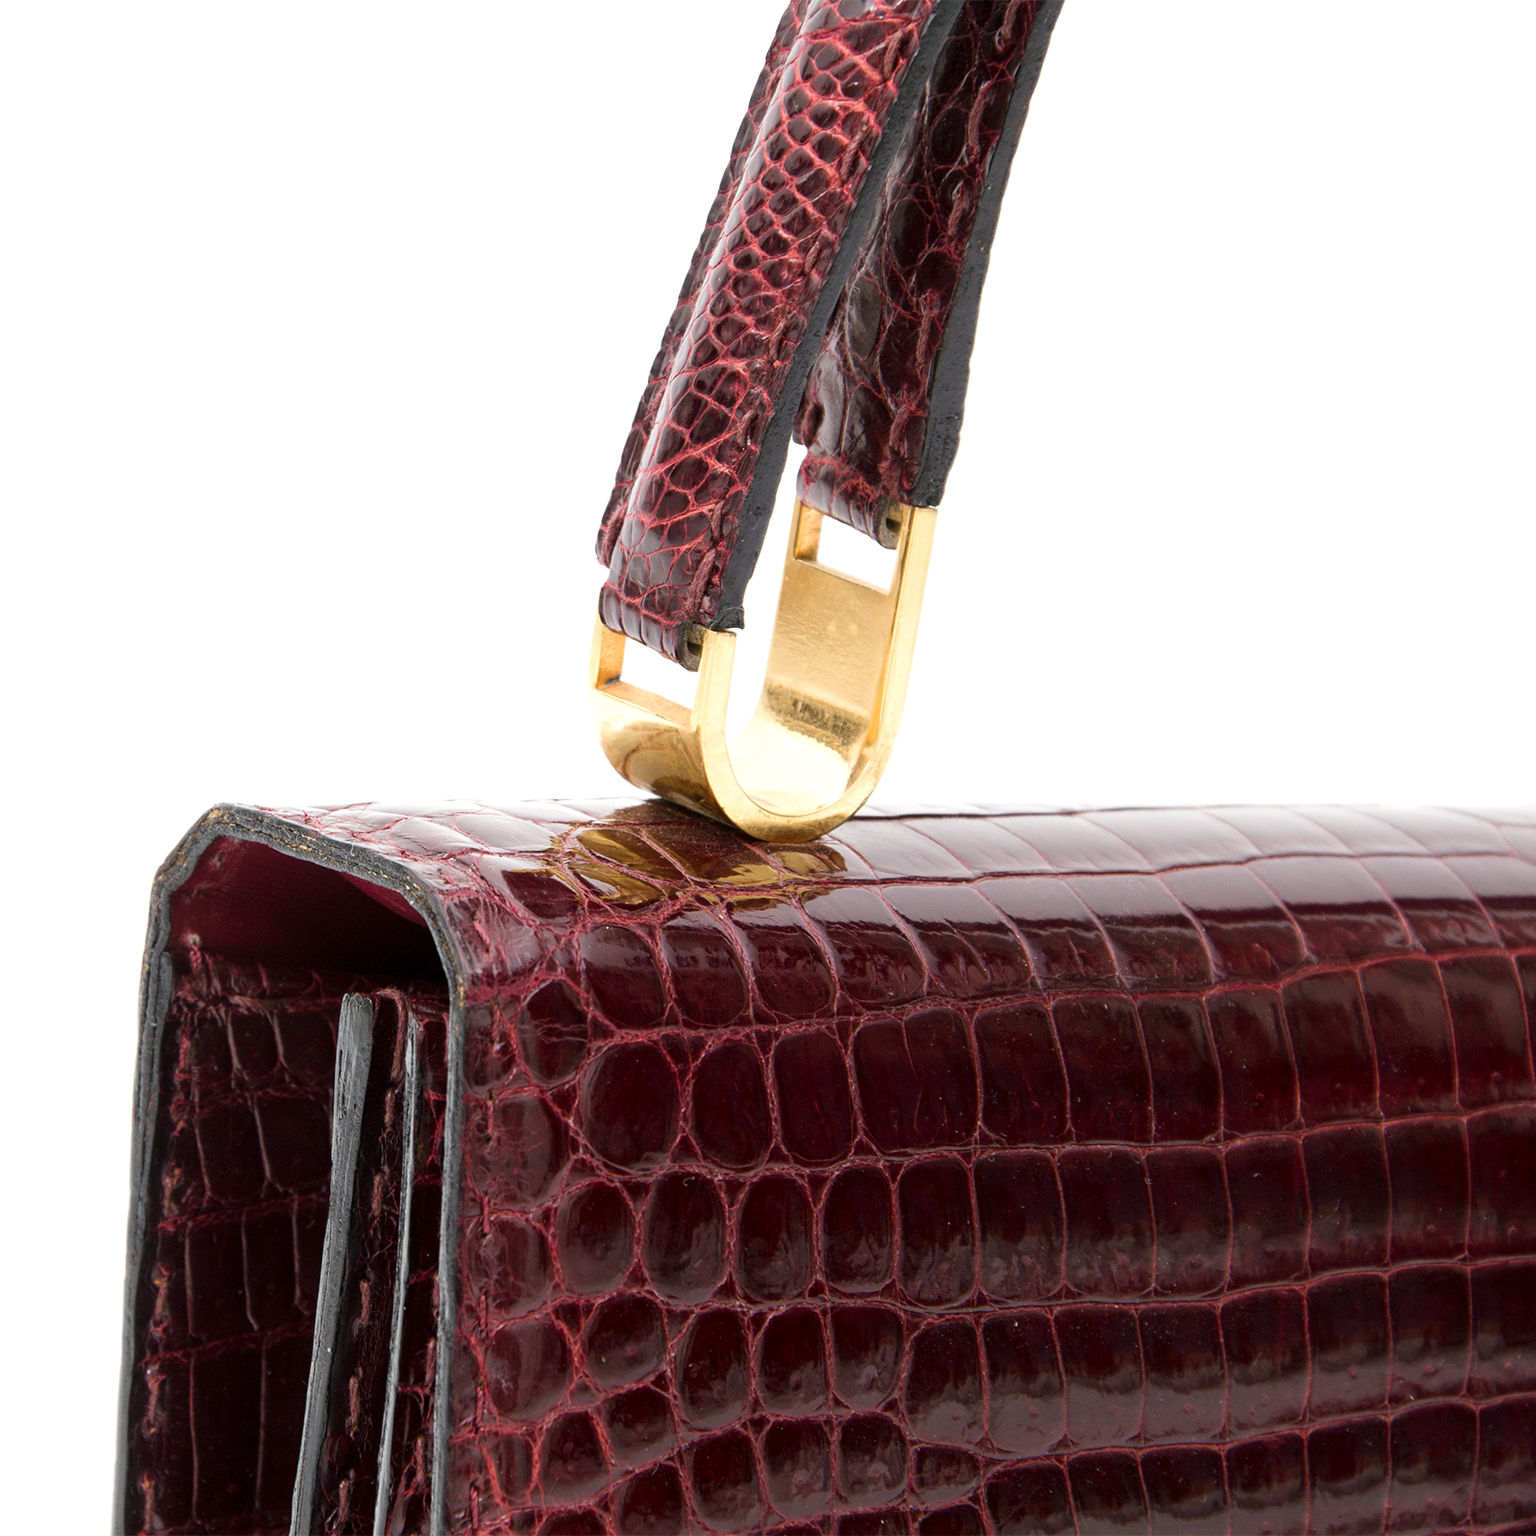 ... Delvaux Burgundy Croco Shoulder Bag For more vintage preloved or new  luxury handbags 19e50f389c9a6